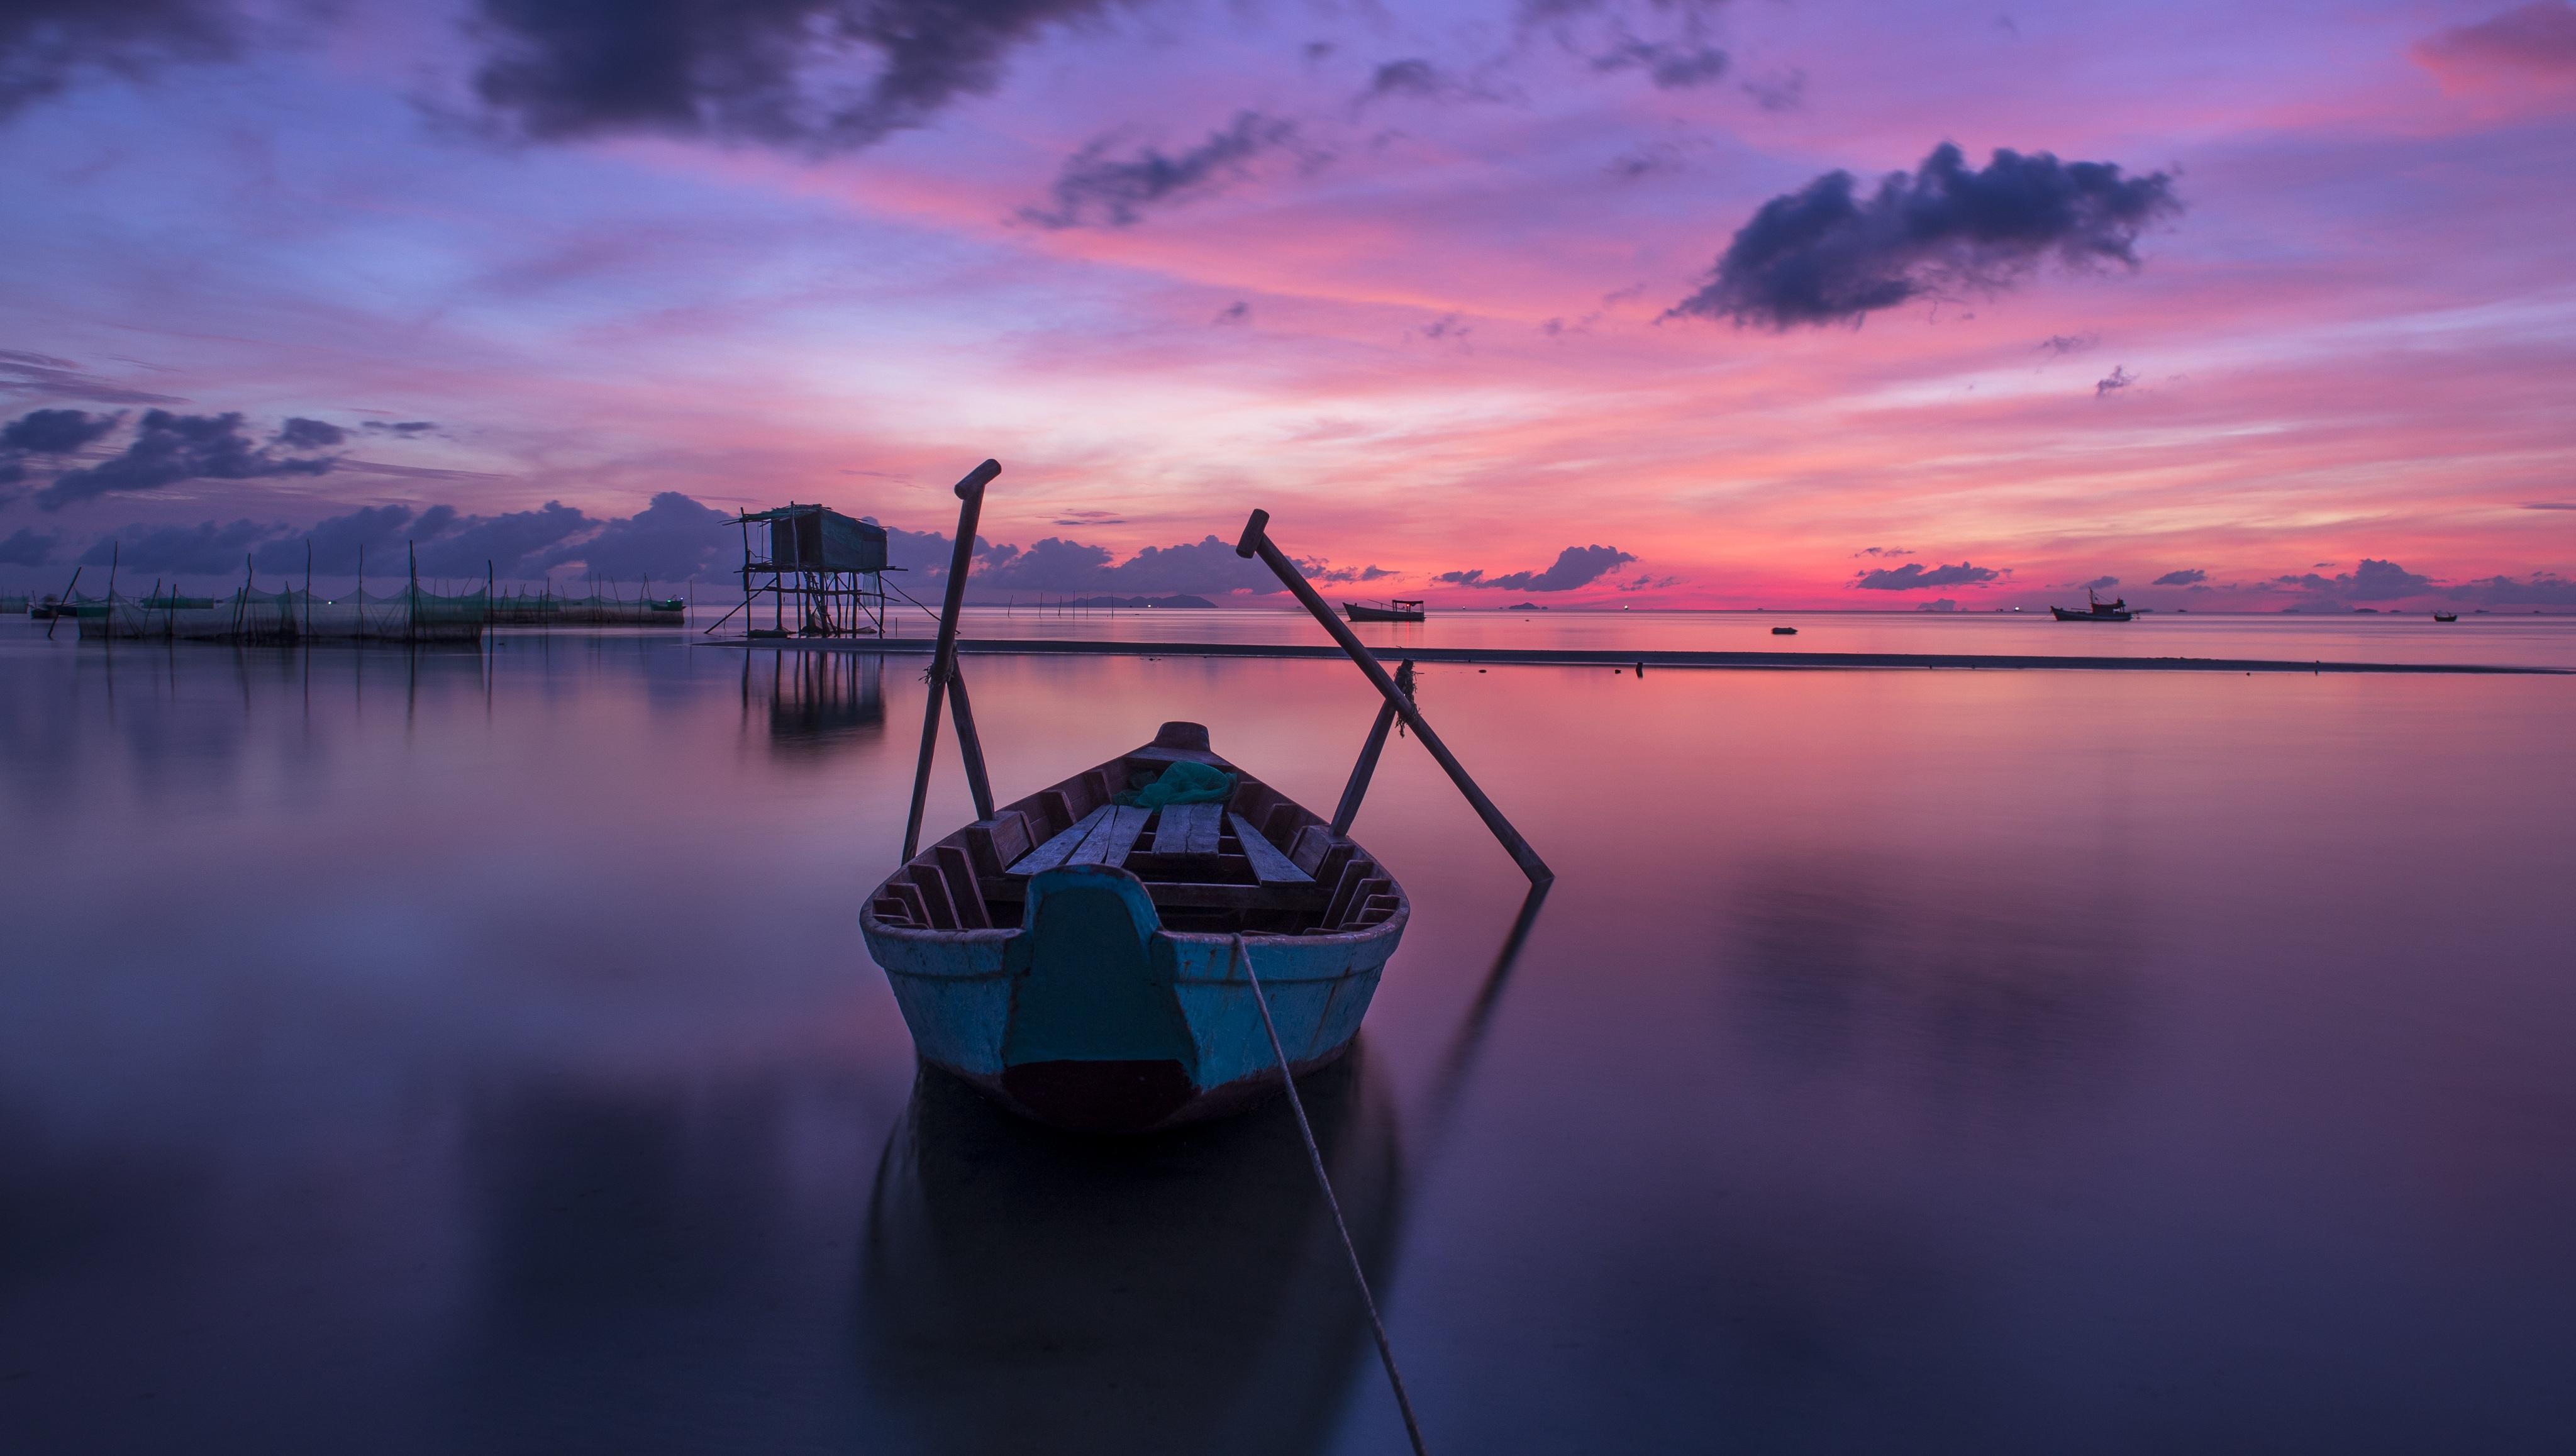 sunrise-phu-quoc-island-ocean.jpg (4096×2315)